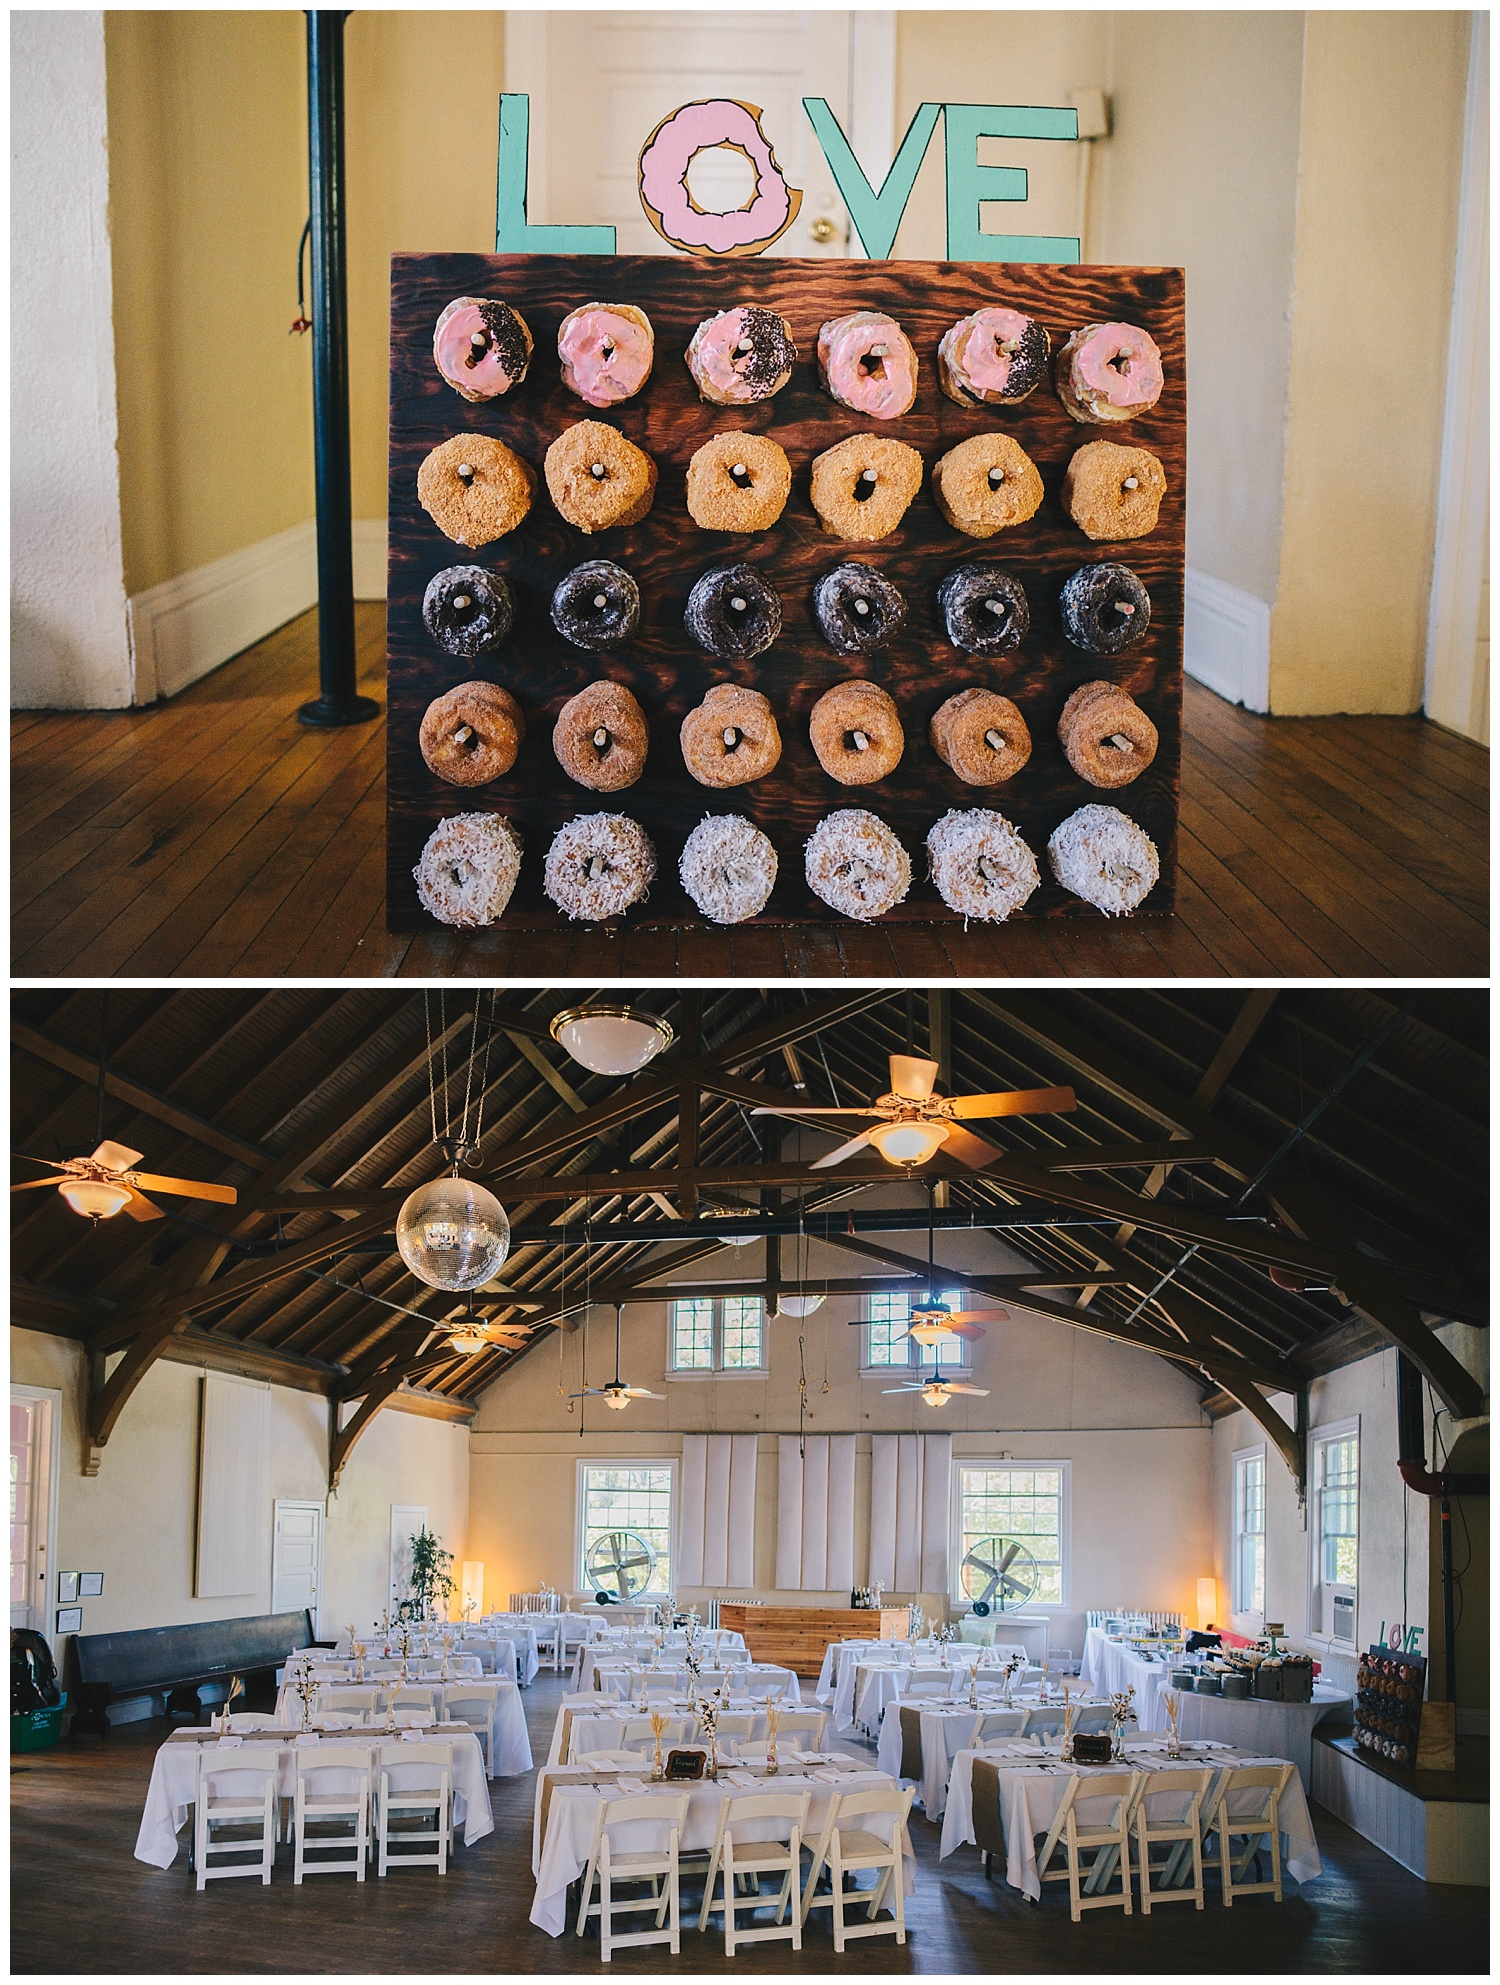 RVA-Donut-Wall.jpg